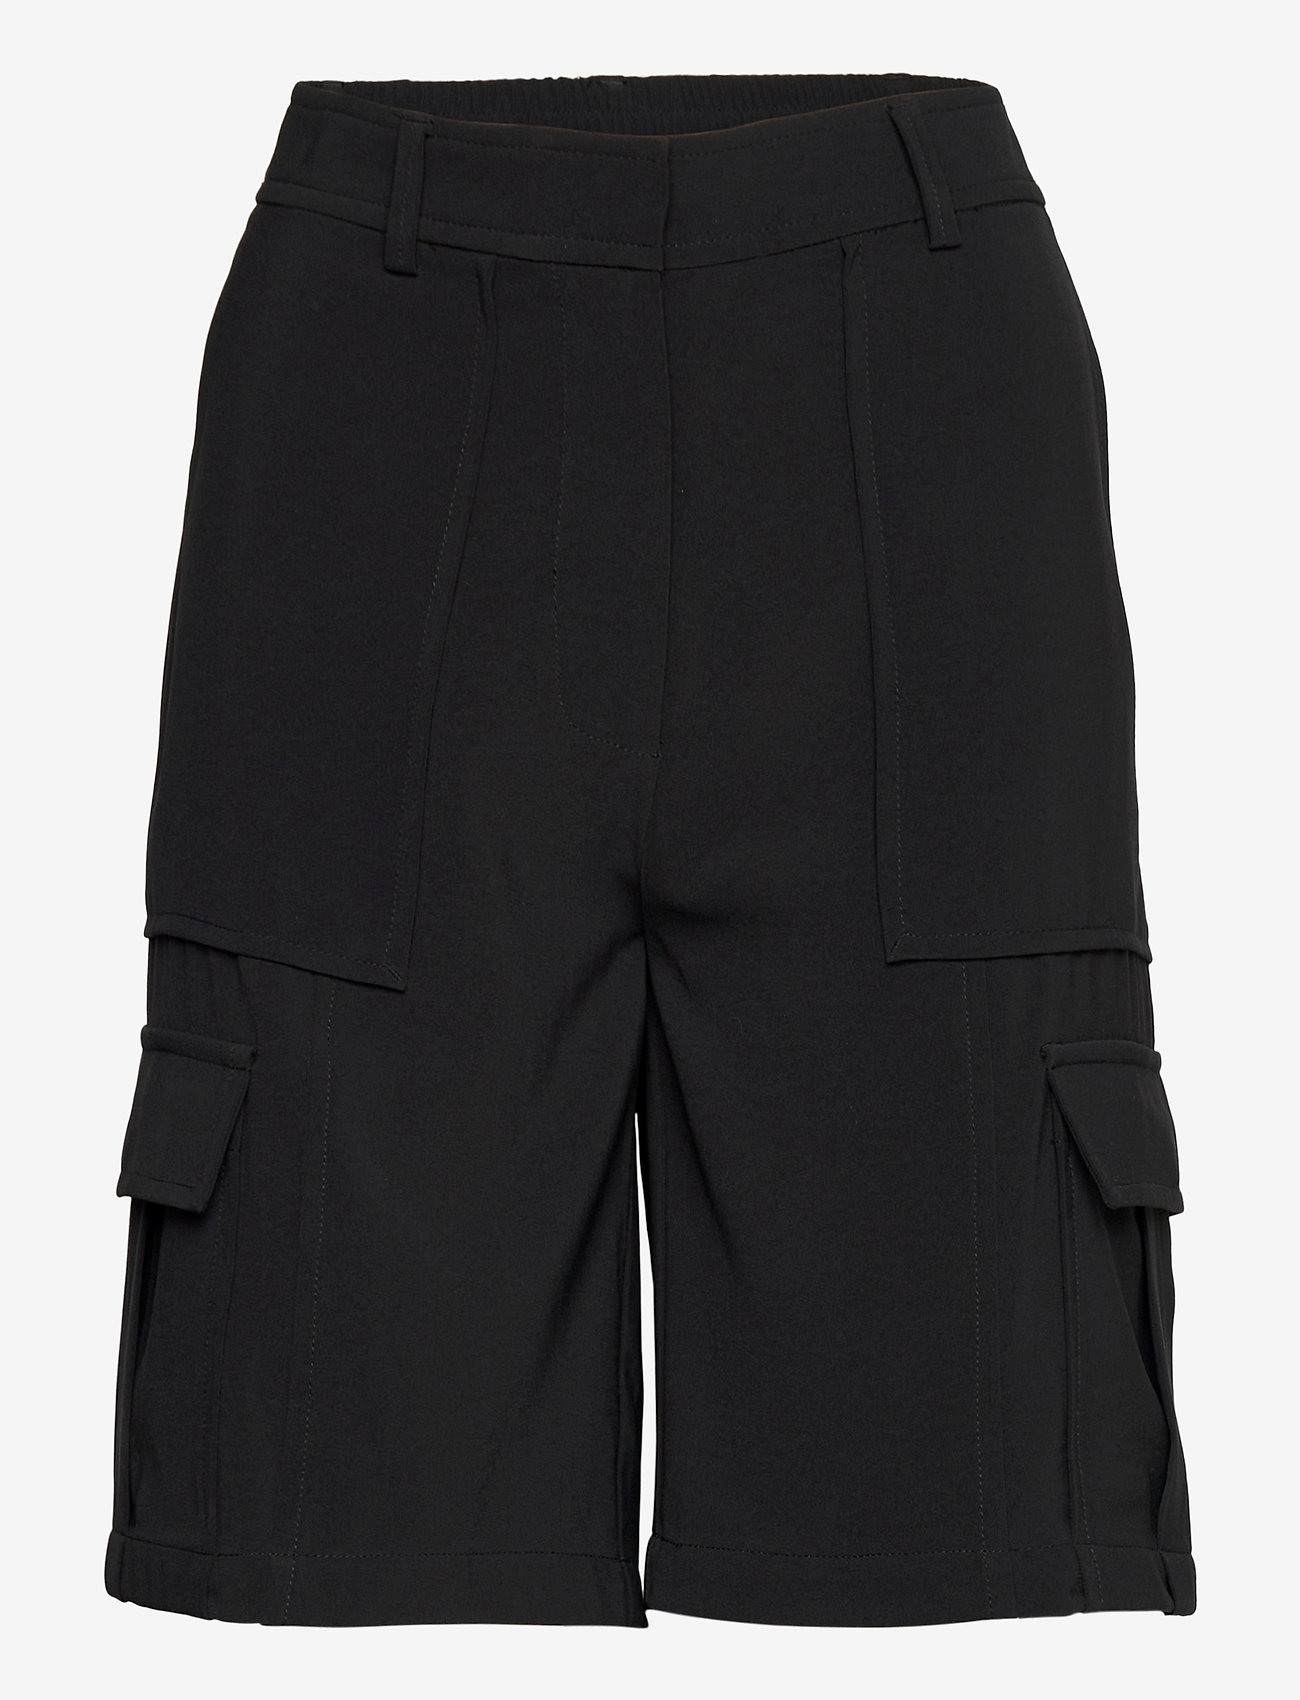 Samsøe Samsøe - Citrine shorts 10654 - bermudas - black - 0